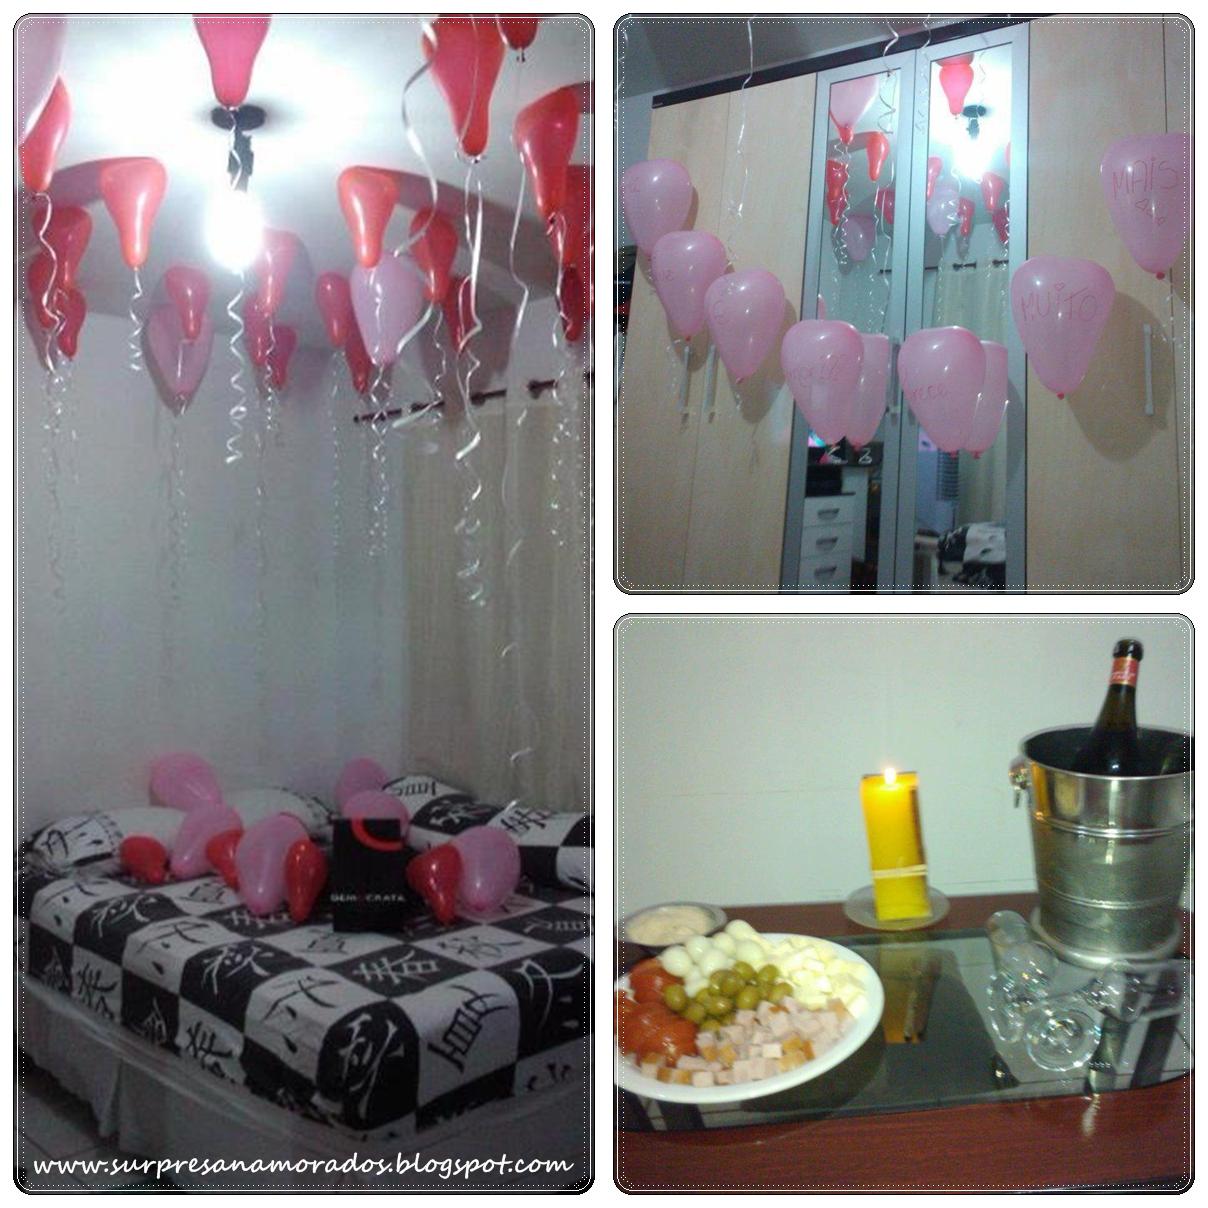 festa surpresa para o namorado